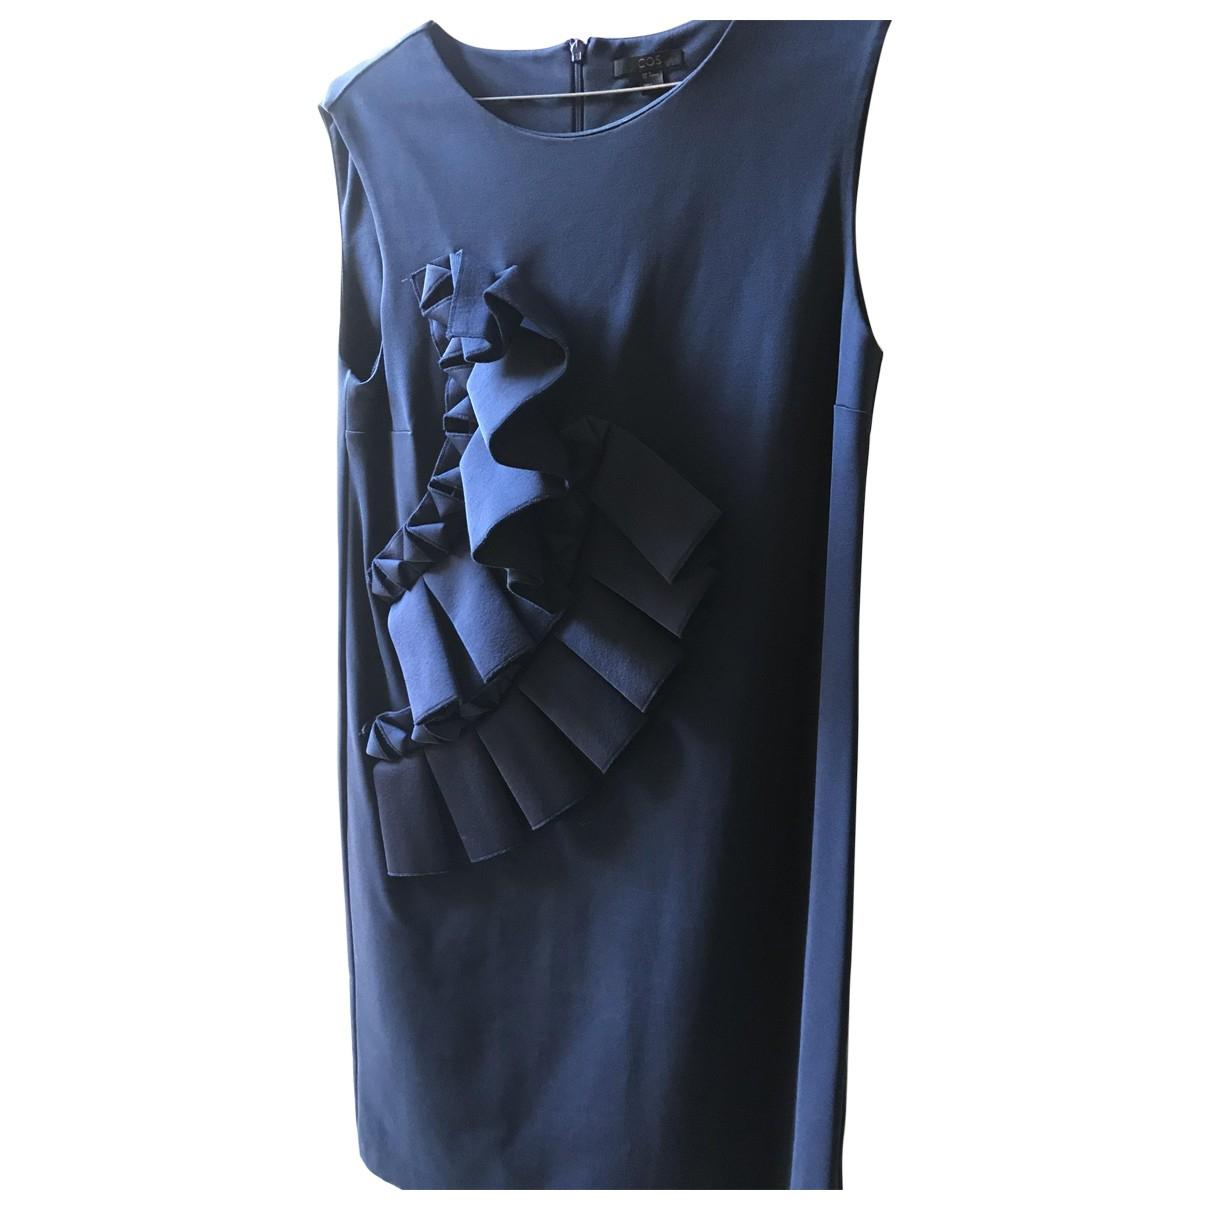 Cos N Blue Cotton - elasthane dress for Women M International